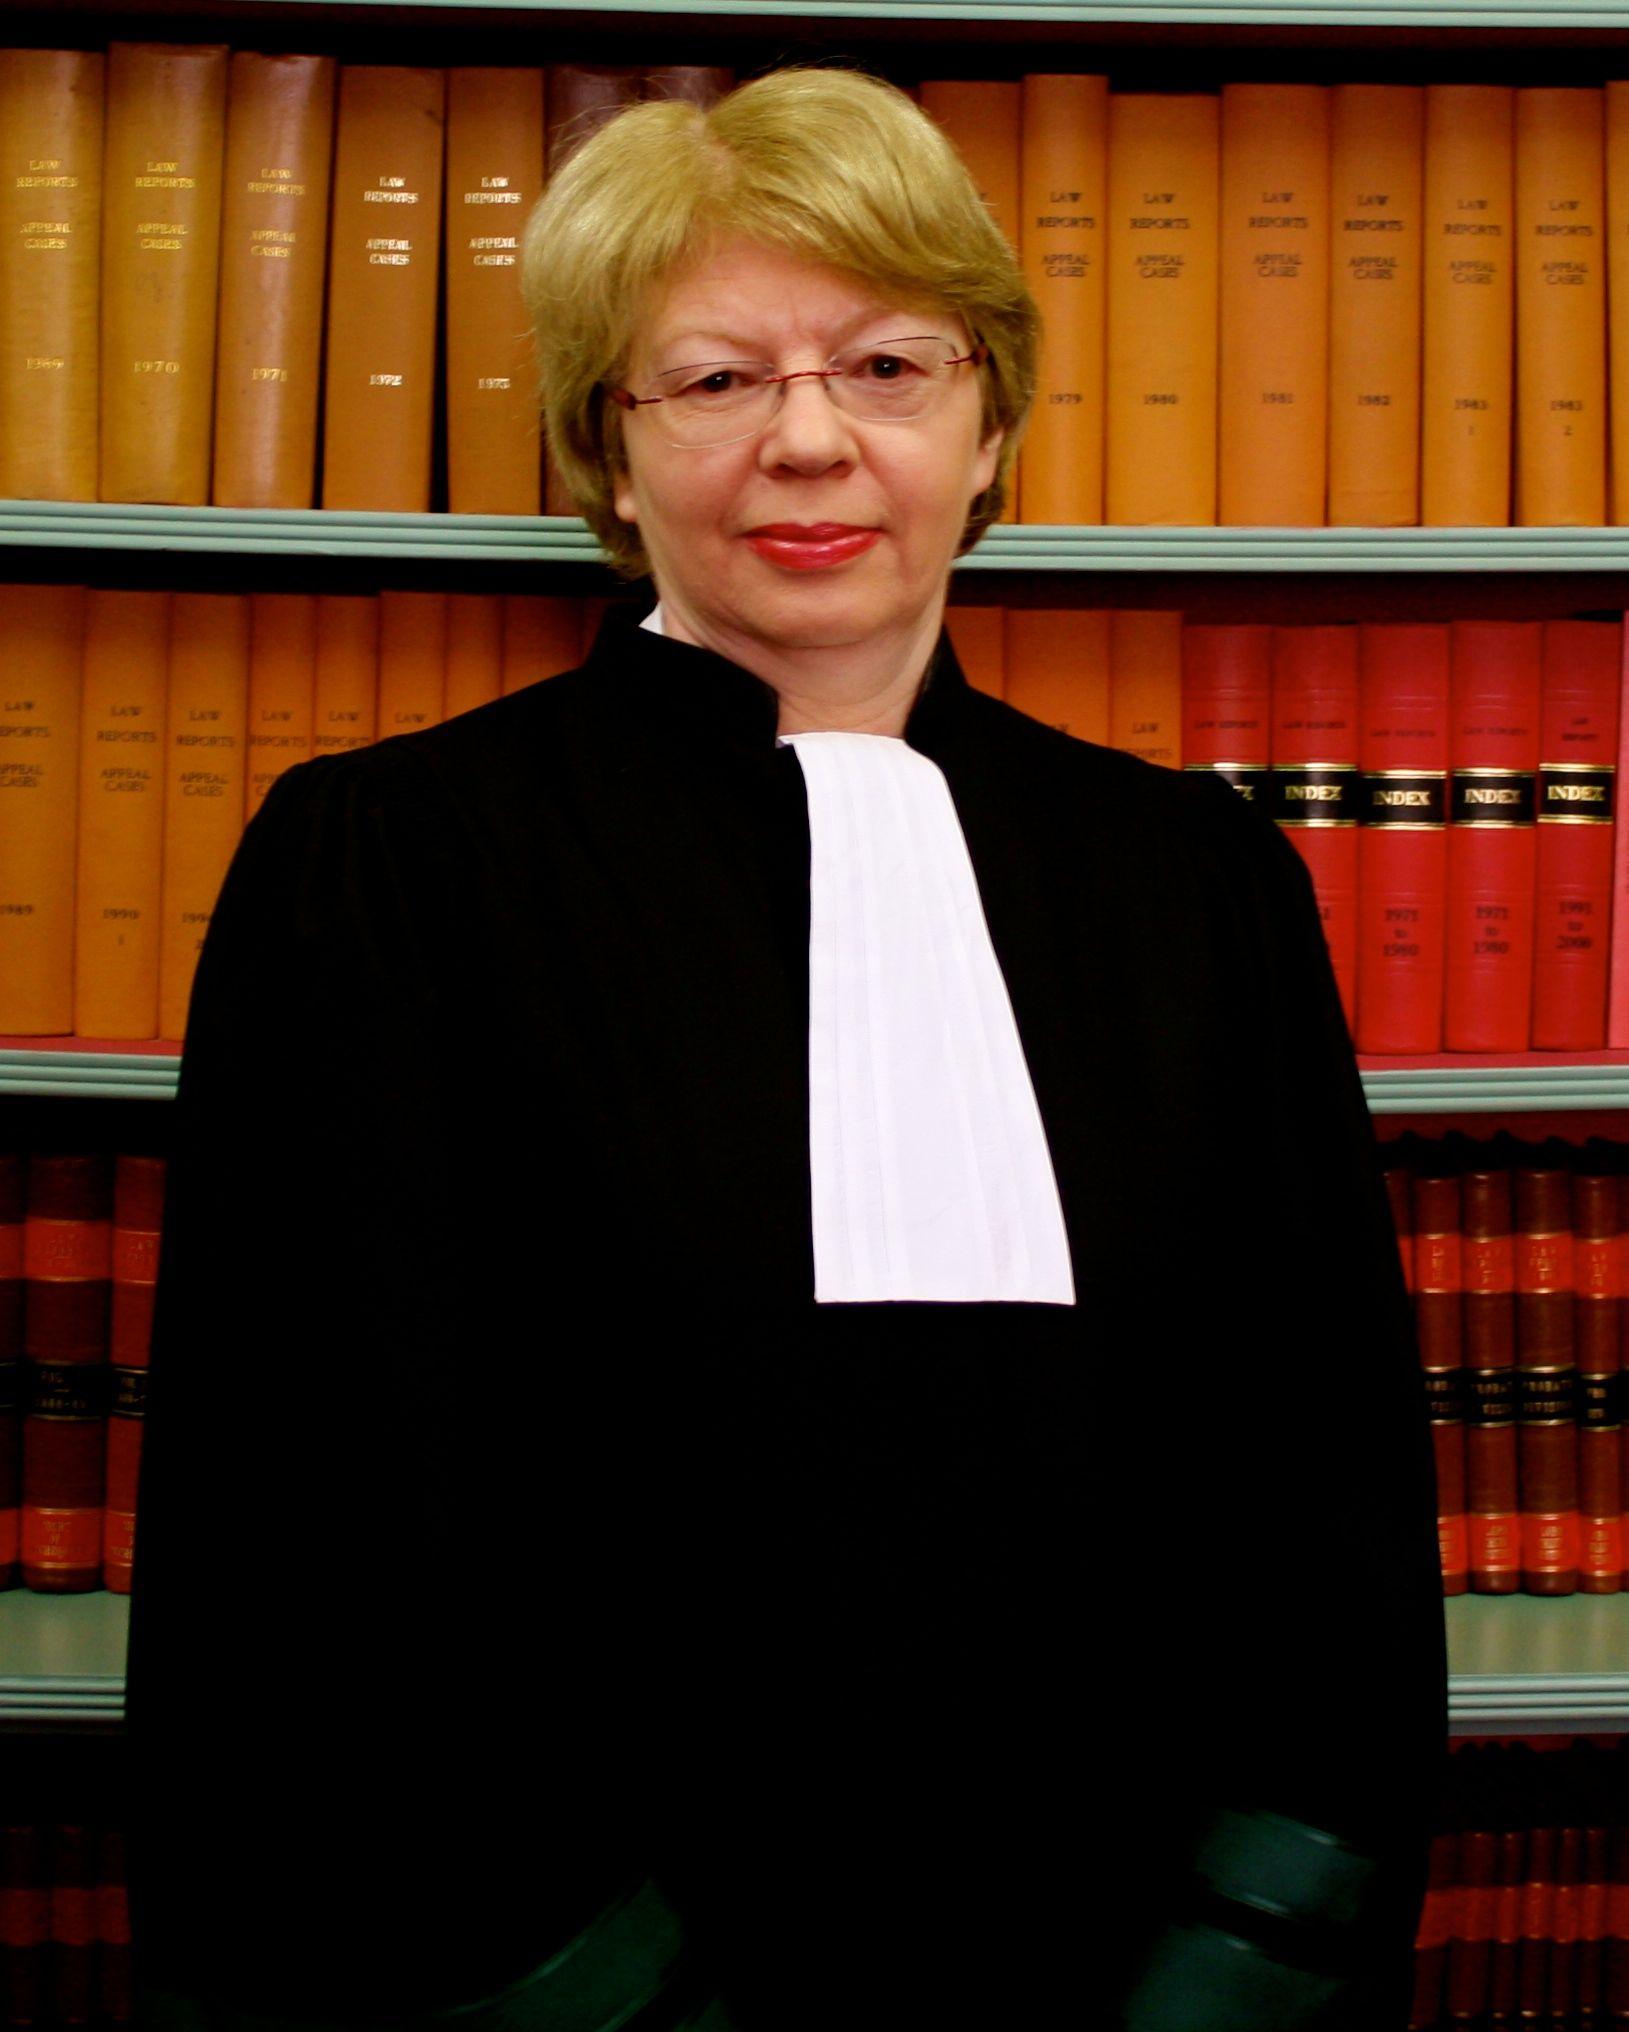 present supreme court judges